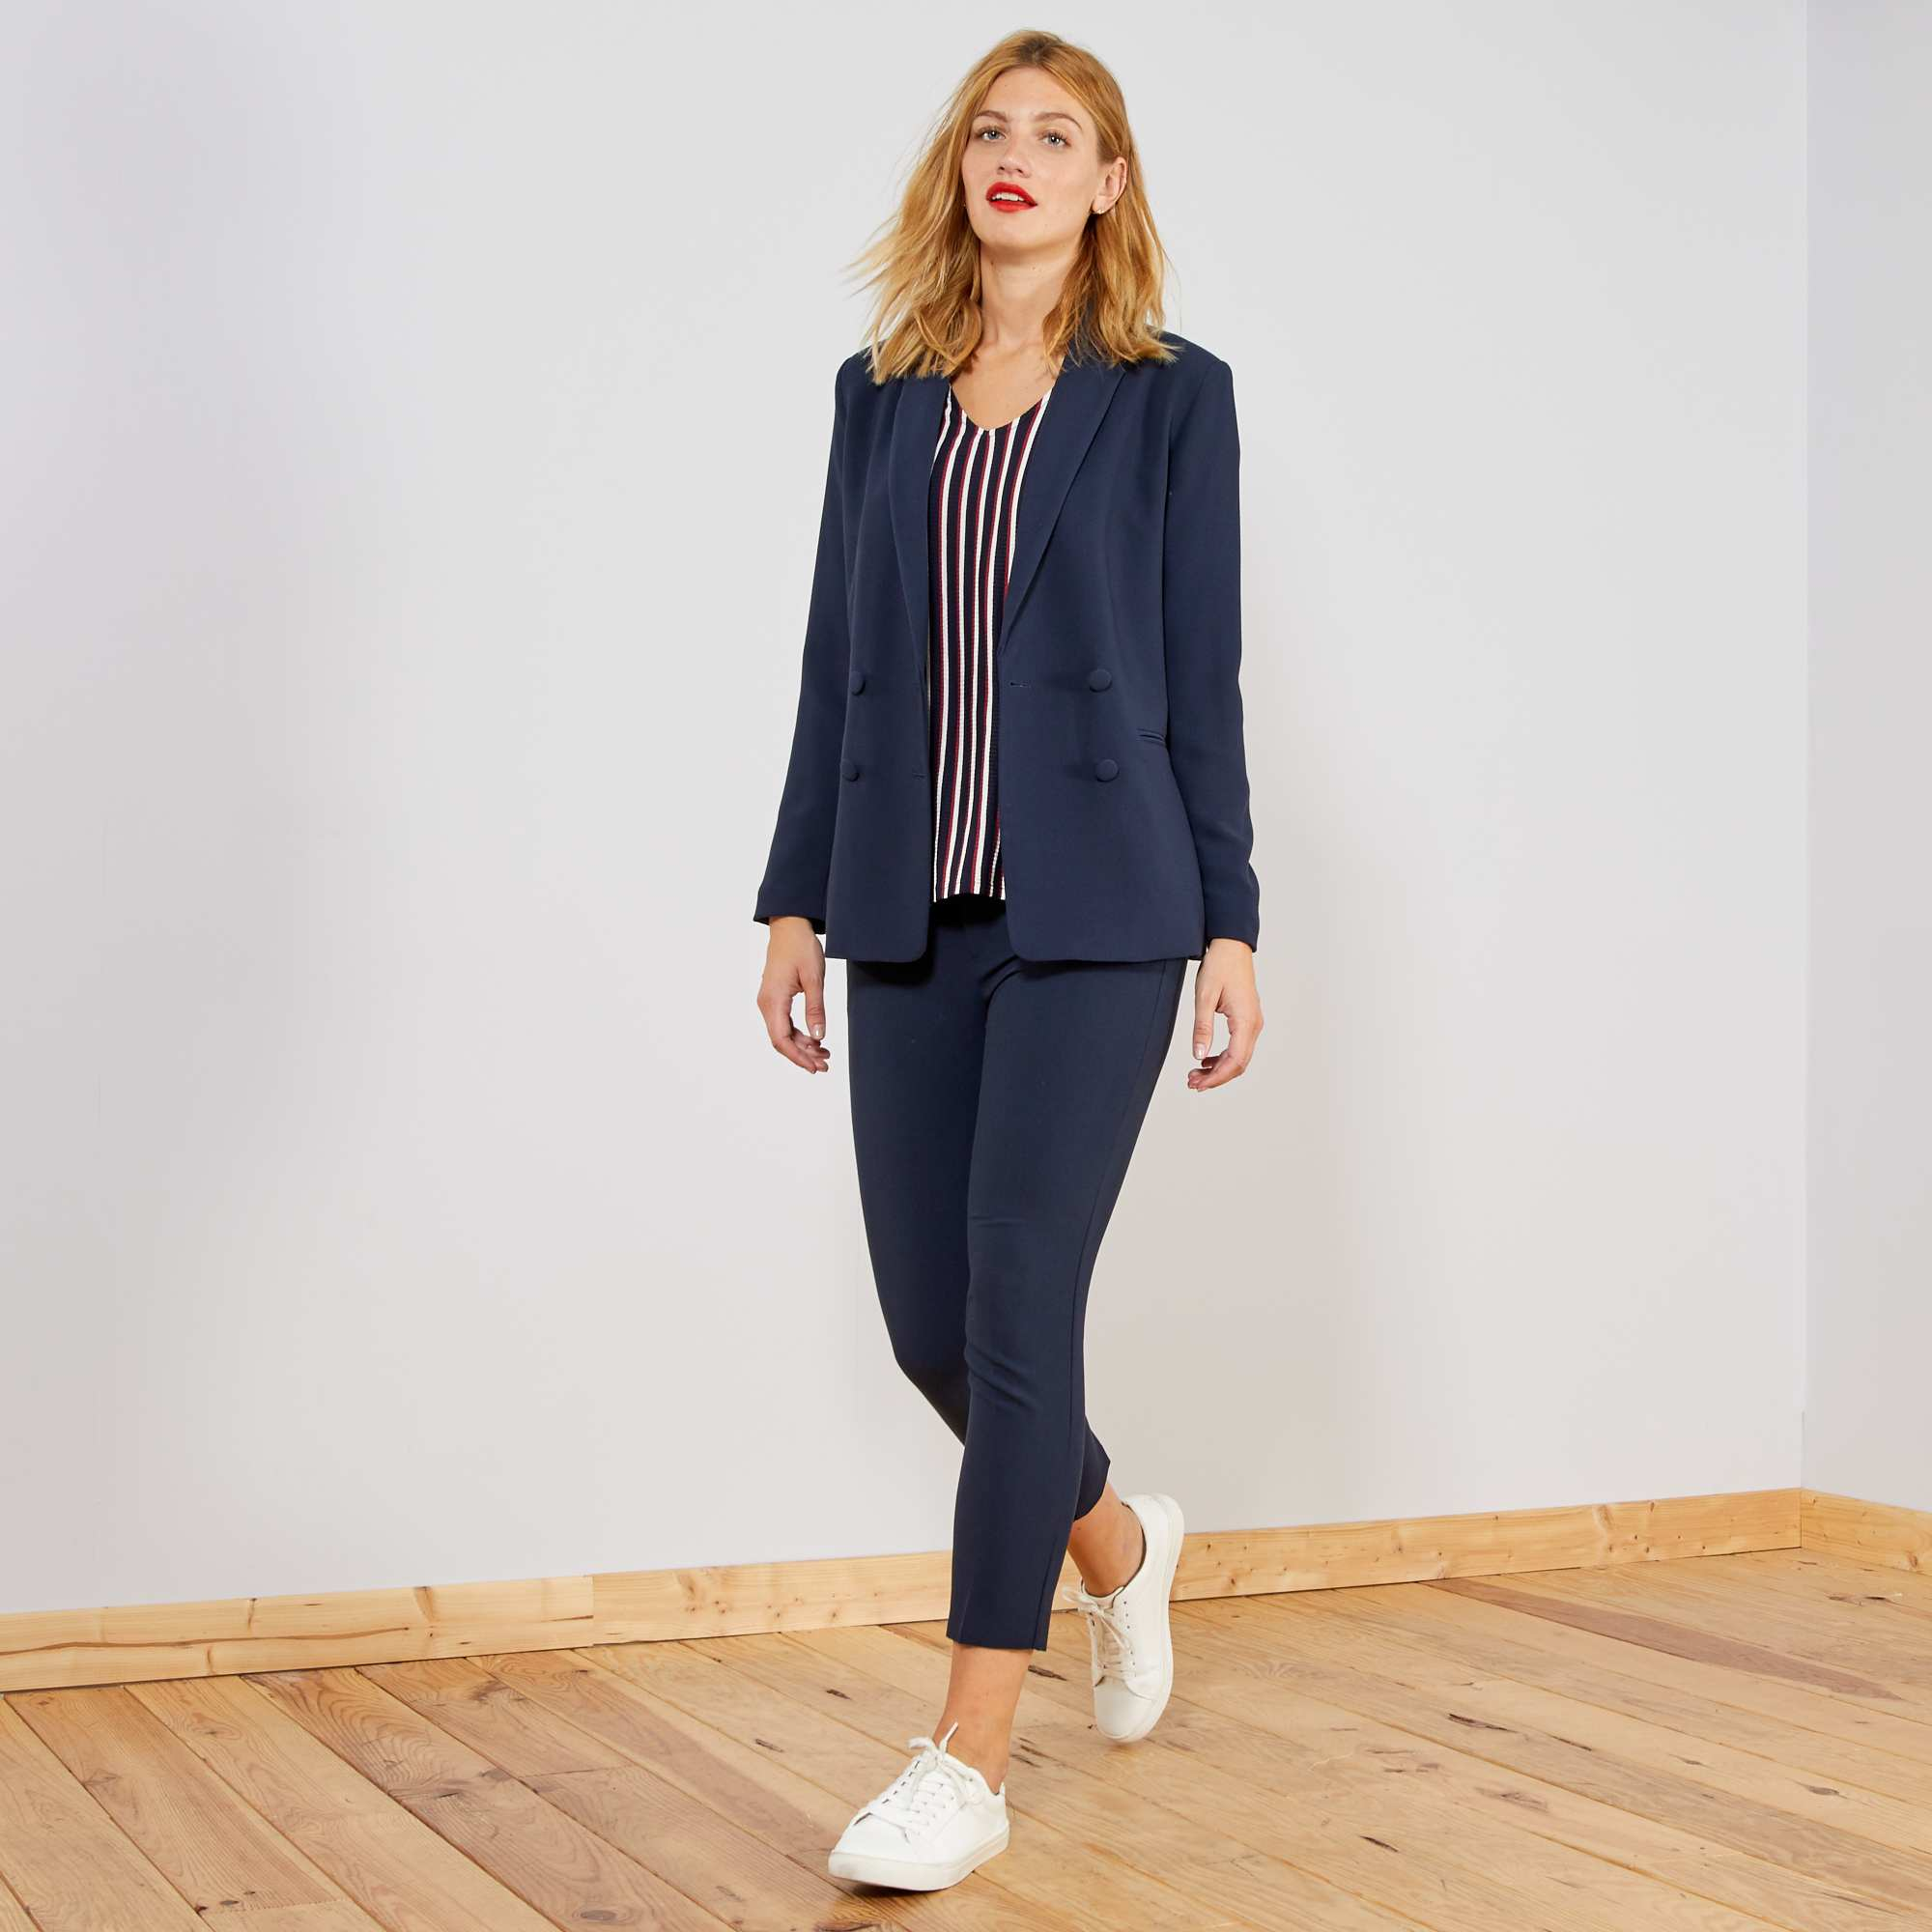 Femme Kiabi Bleu Topkzixlwu Droit Tailleur Pantalon Style 00 15 EbWDYeH2I9